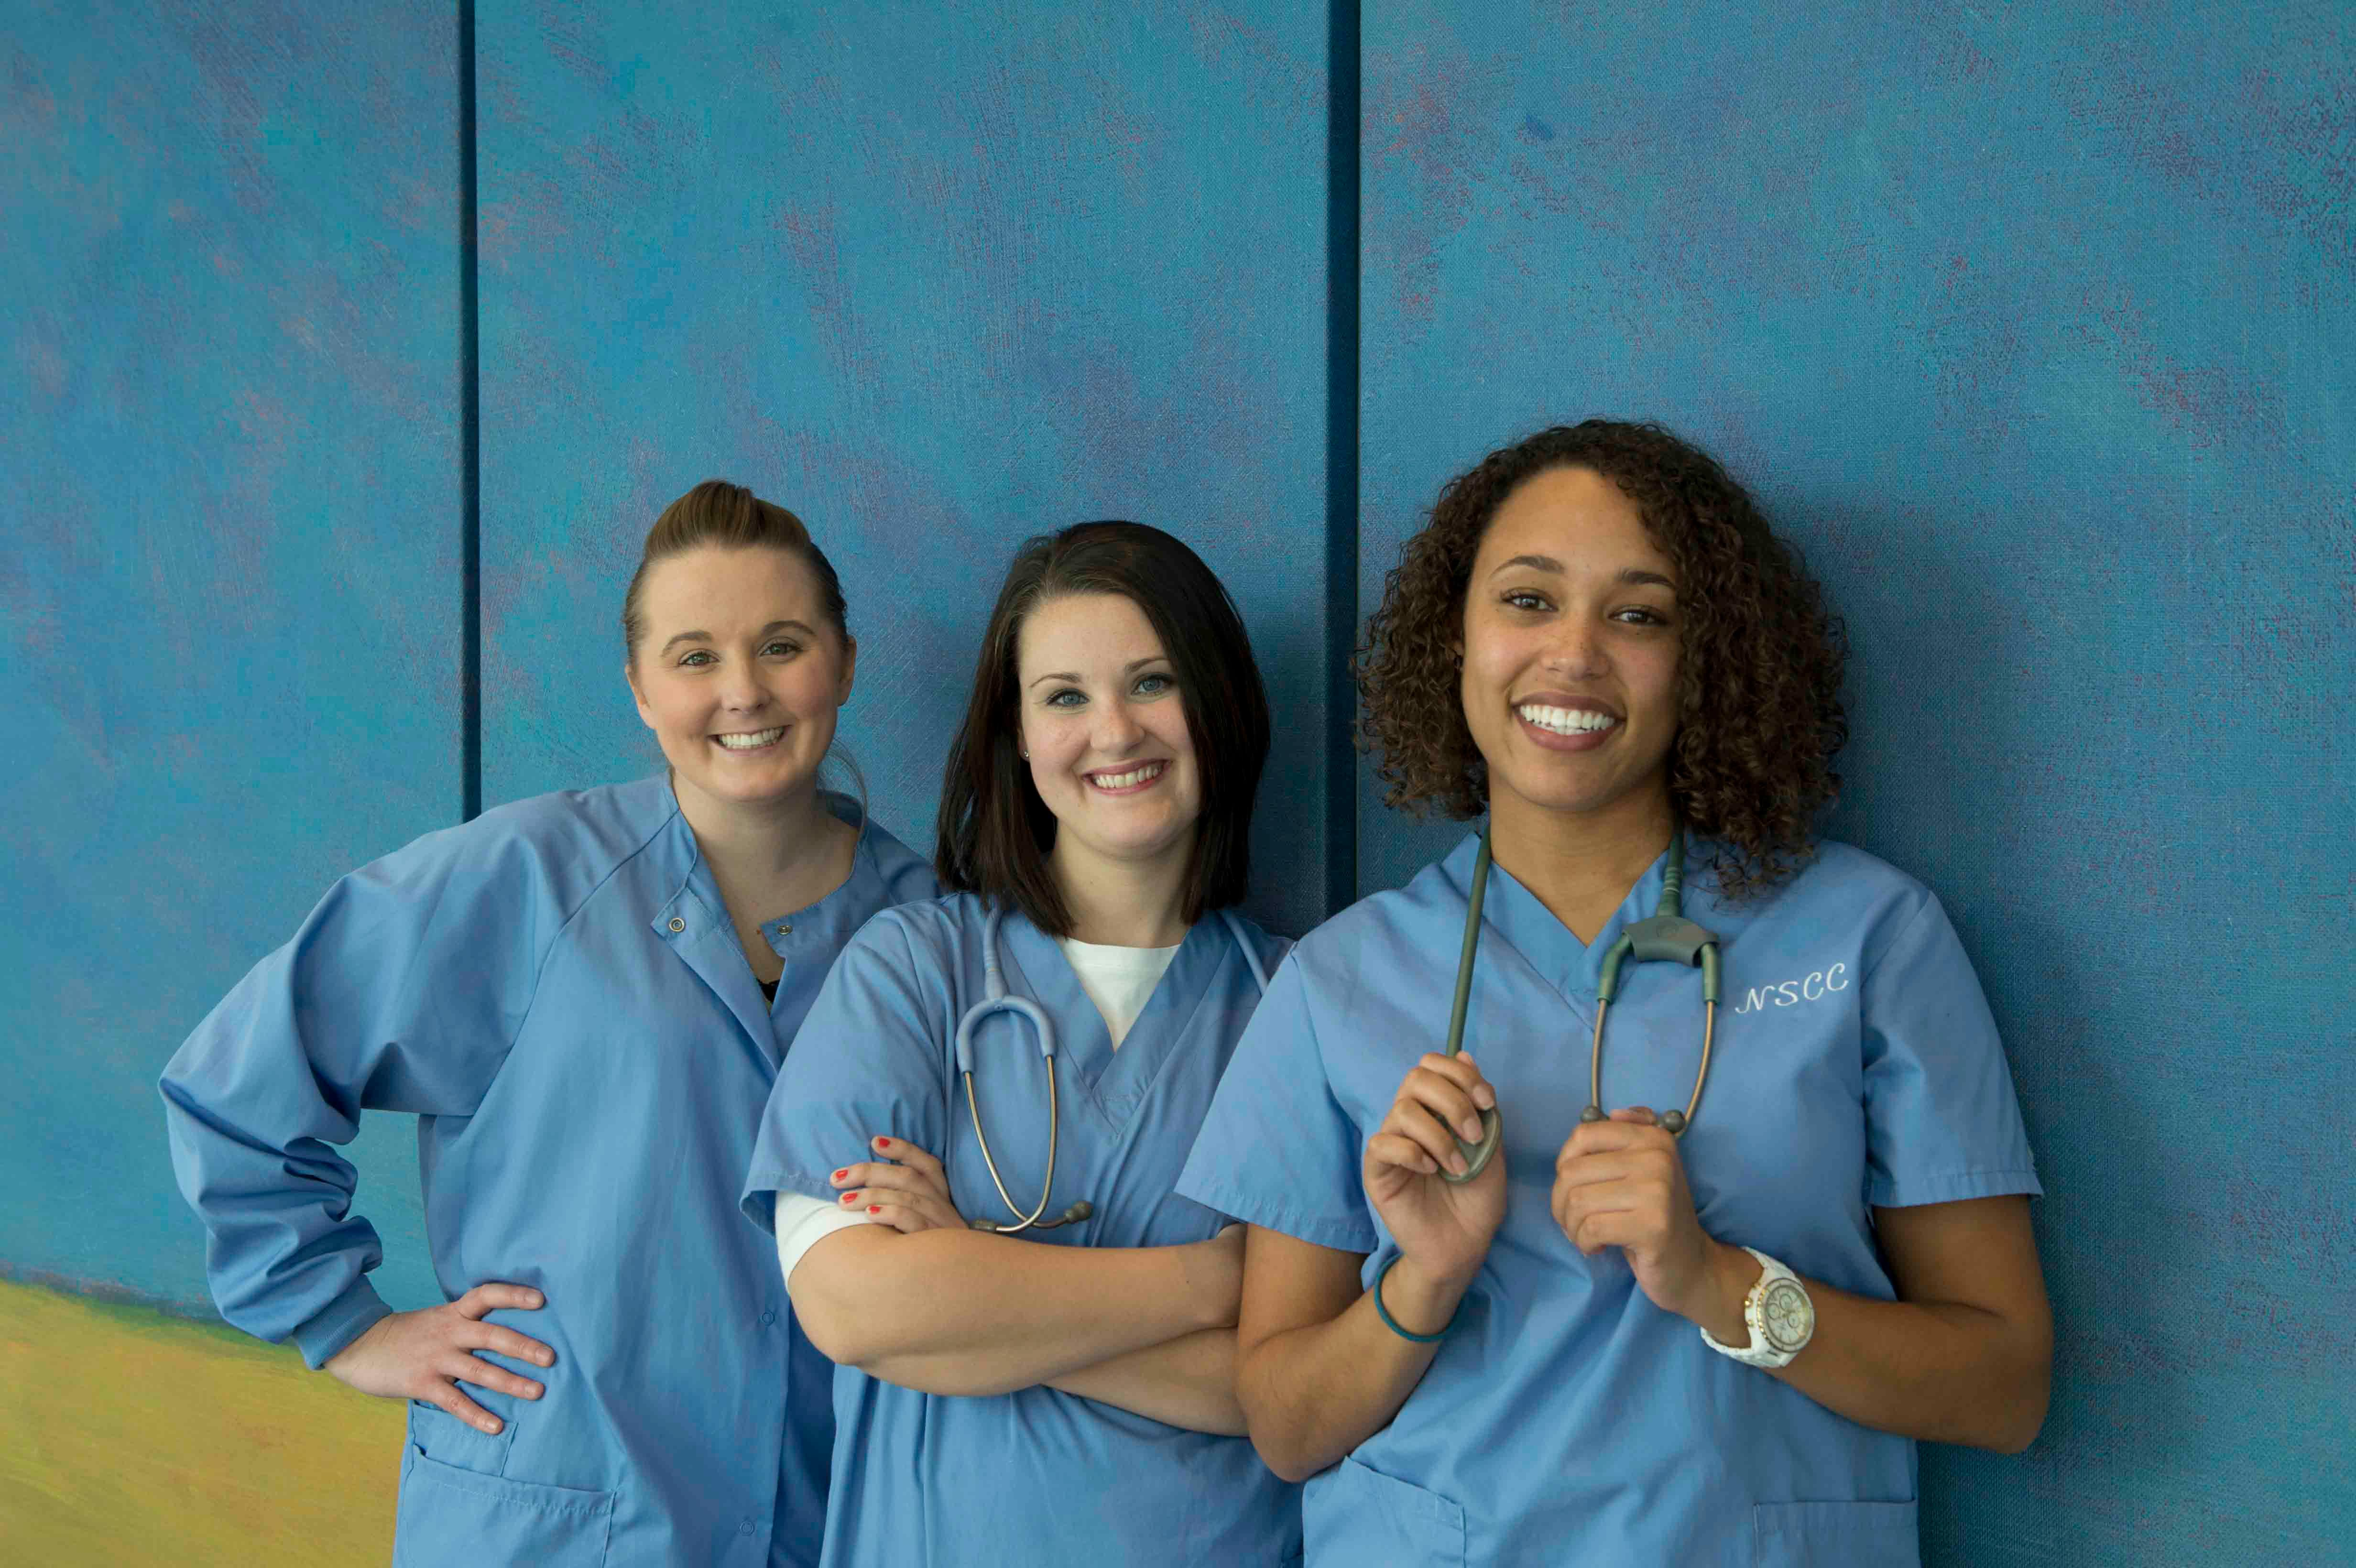 Three nursing students in scrubs